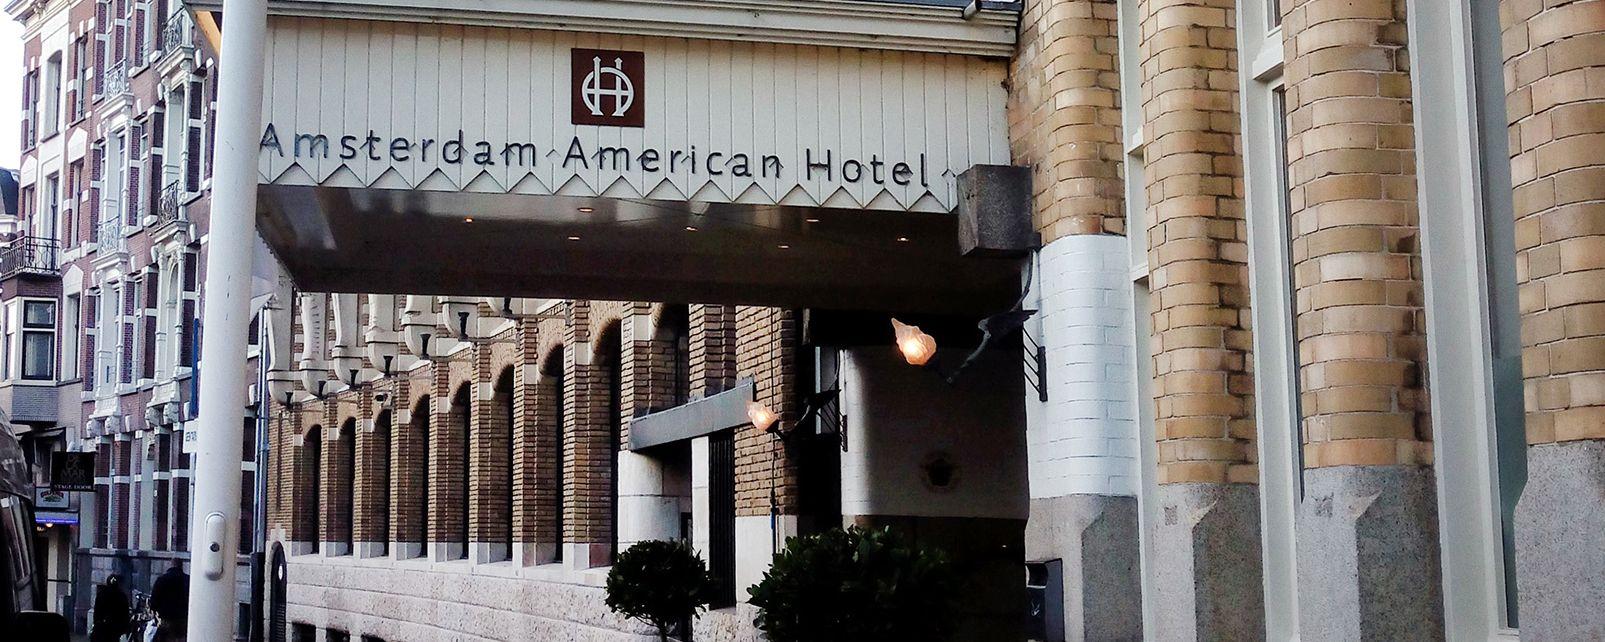 Hotel Amsterdam American Hotel